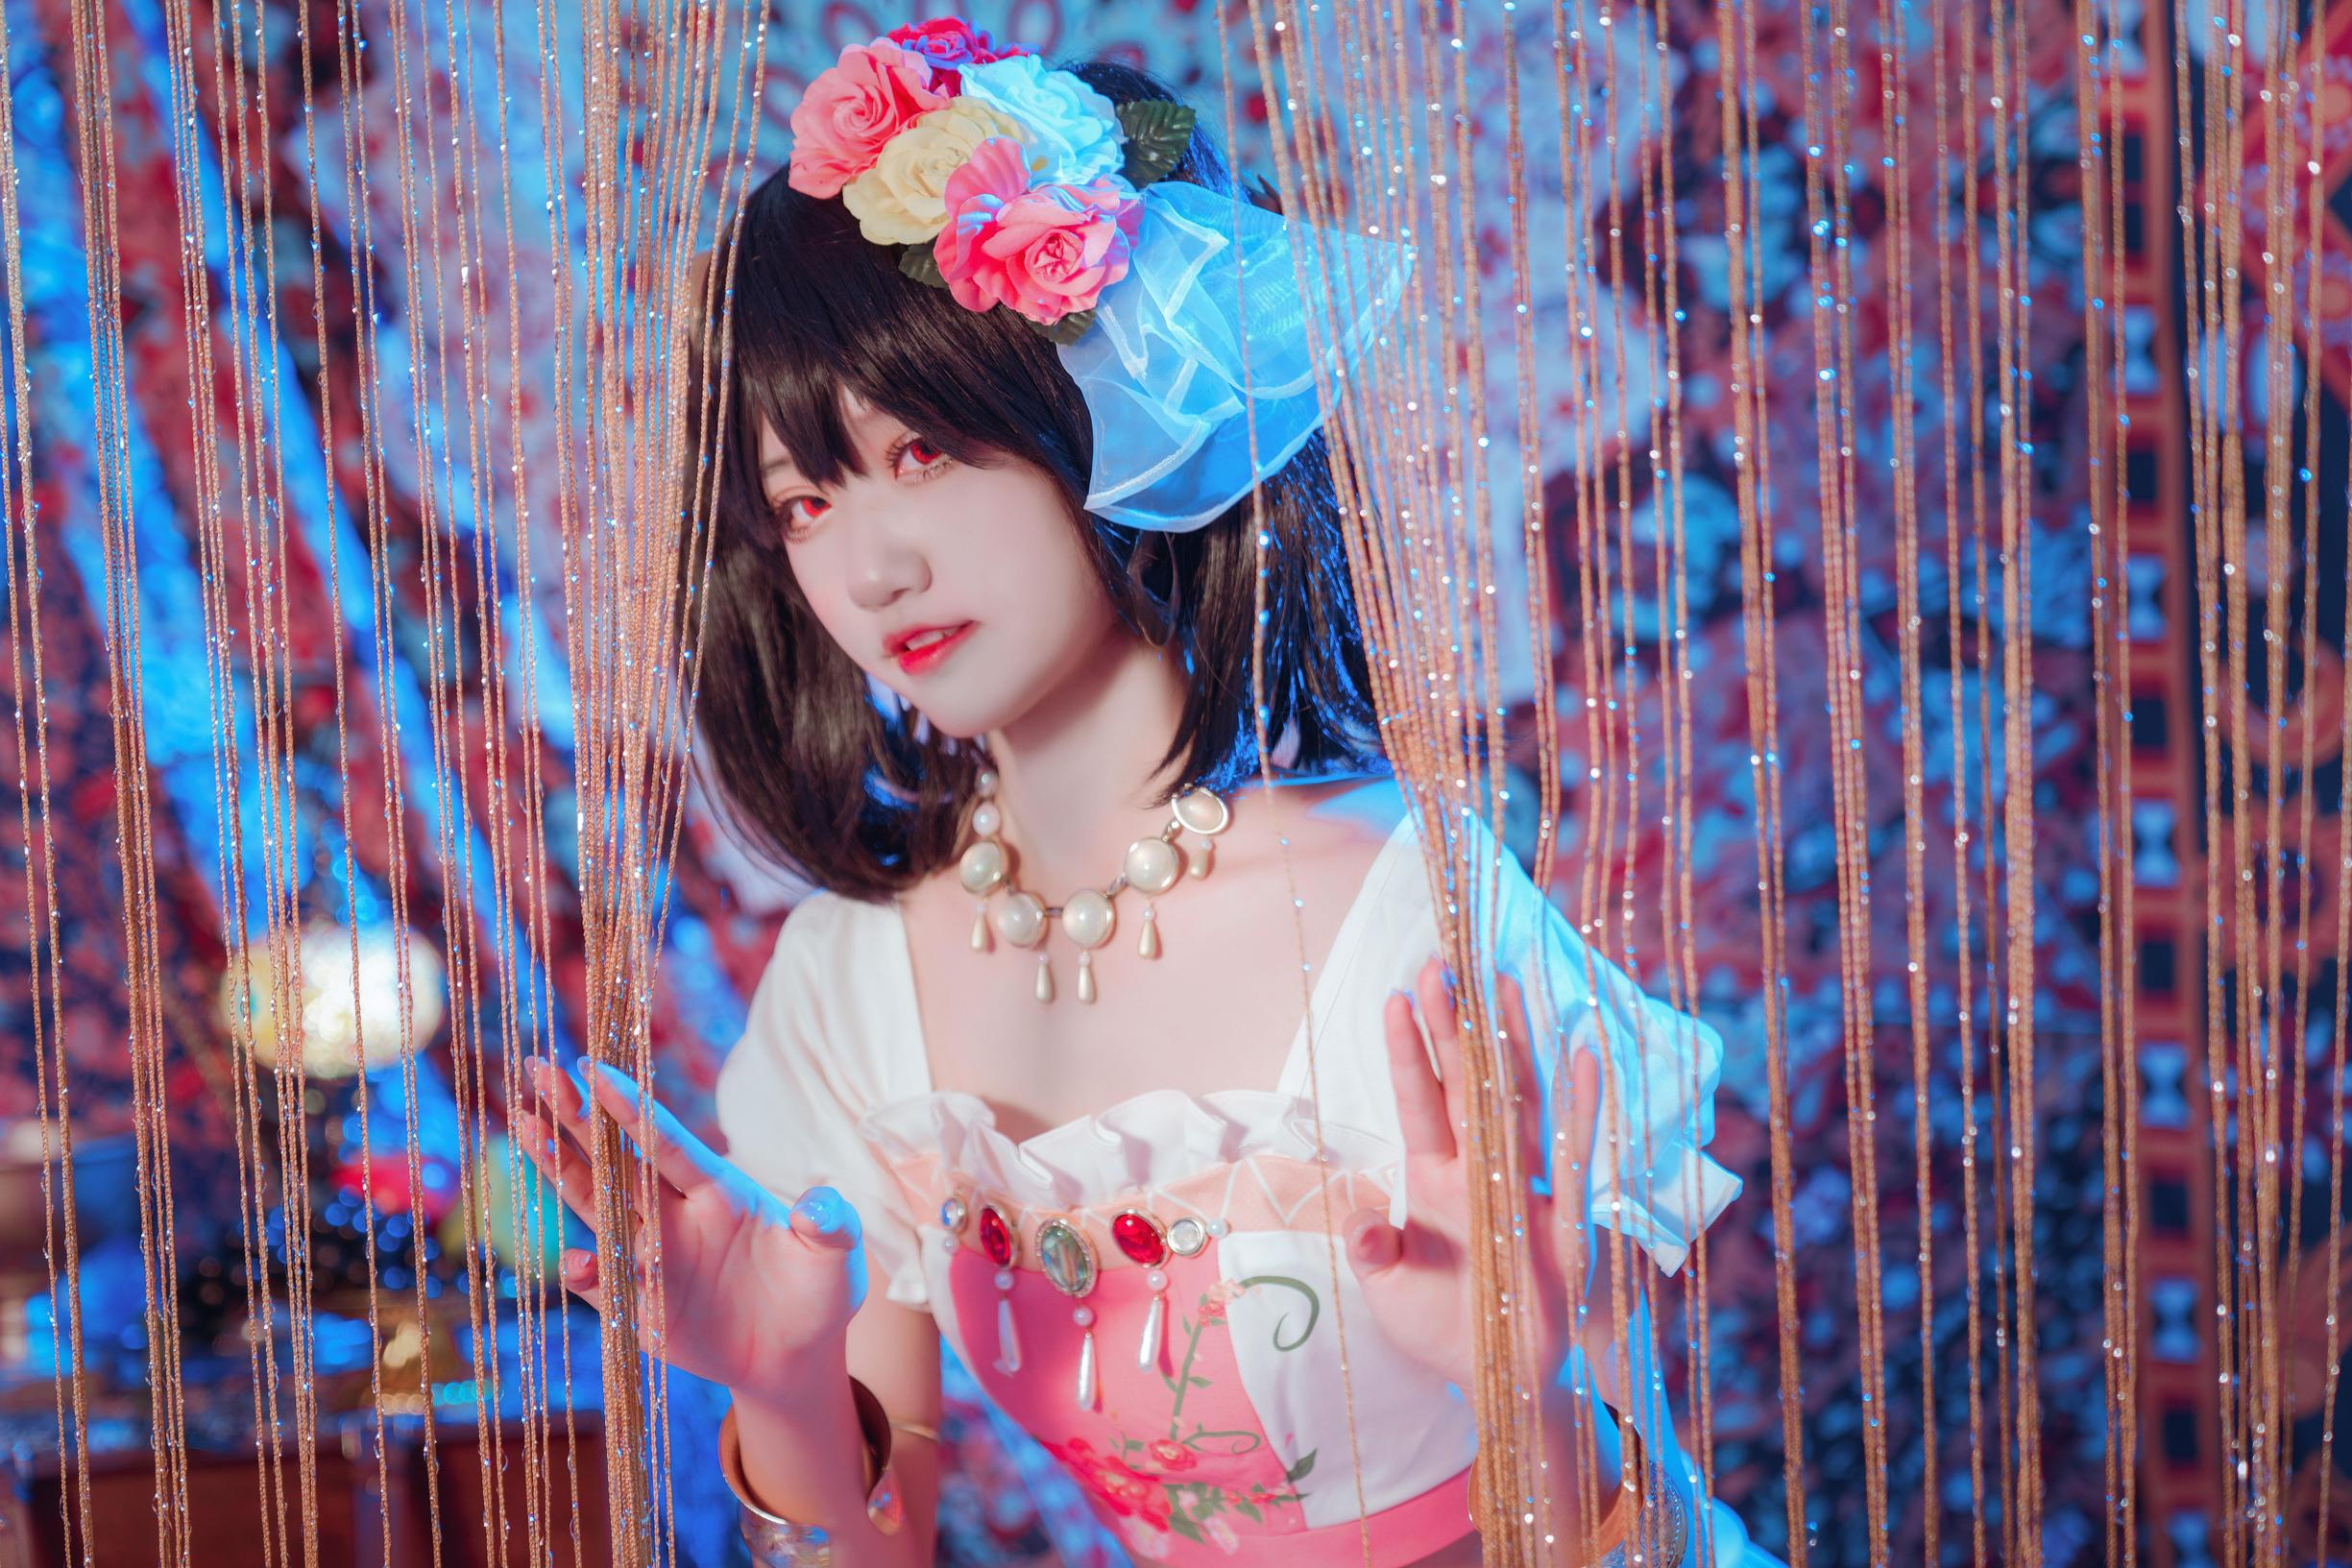 《LOVE LIVE!》正片cosplay【CN:乔儿_】-第1张